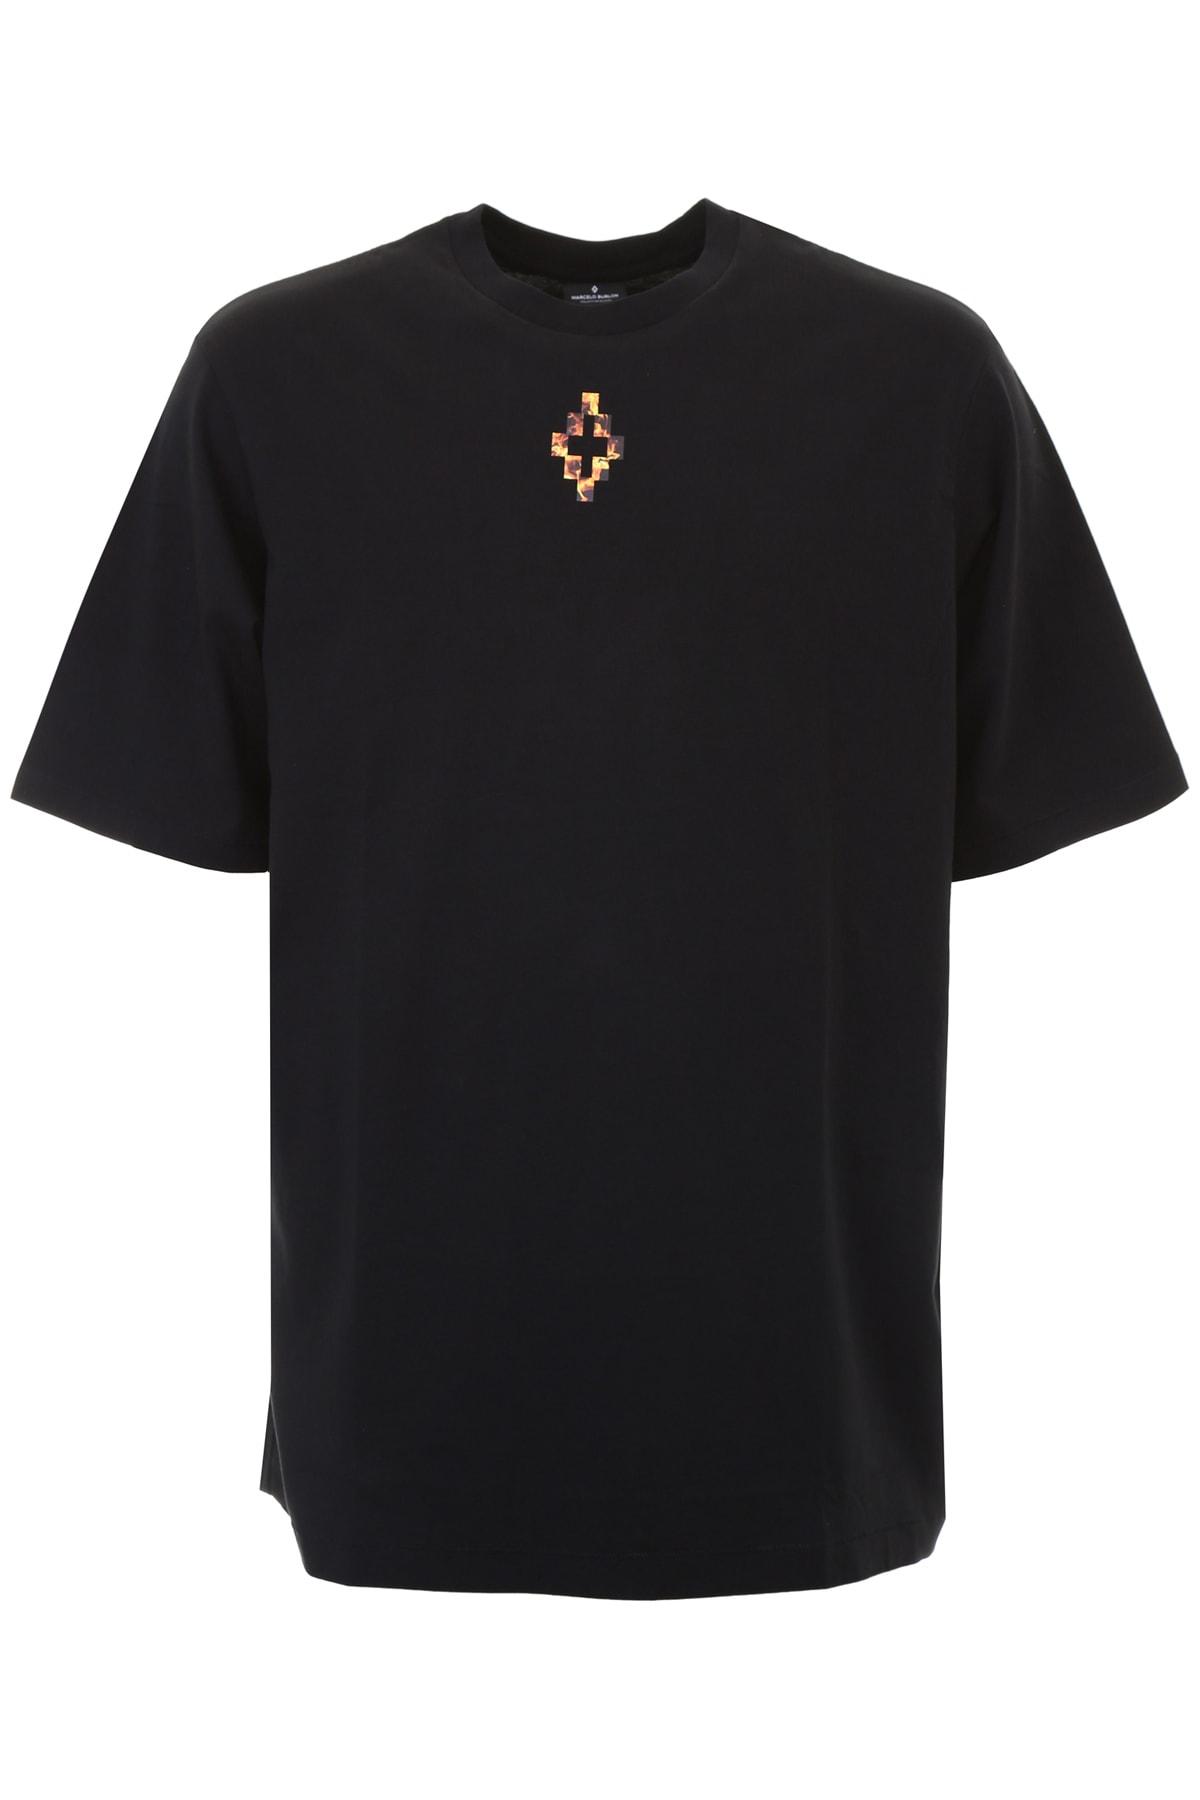 Marcelo Burlon Fire Cross T-shirt